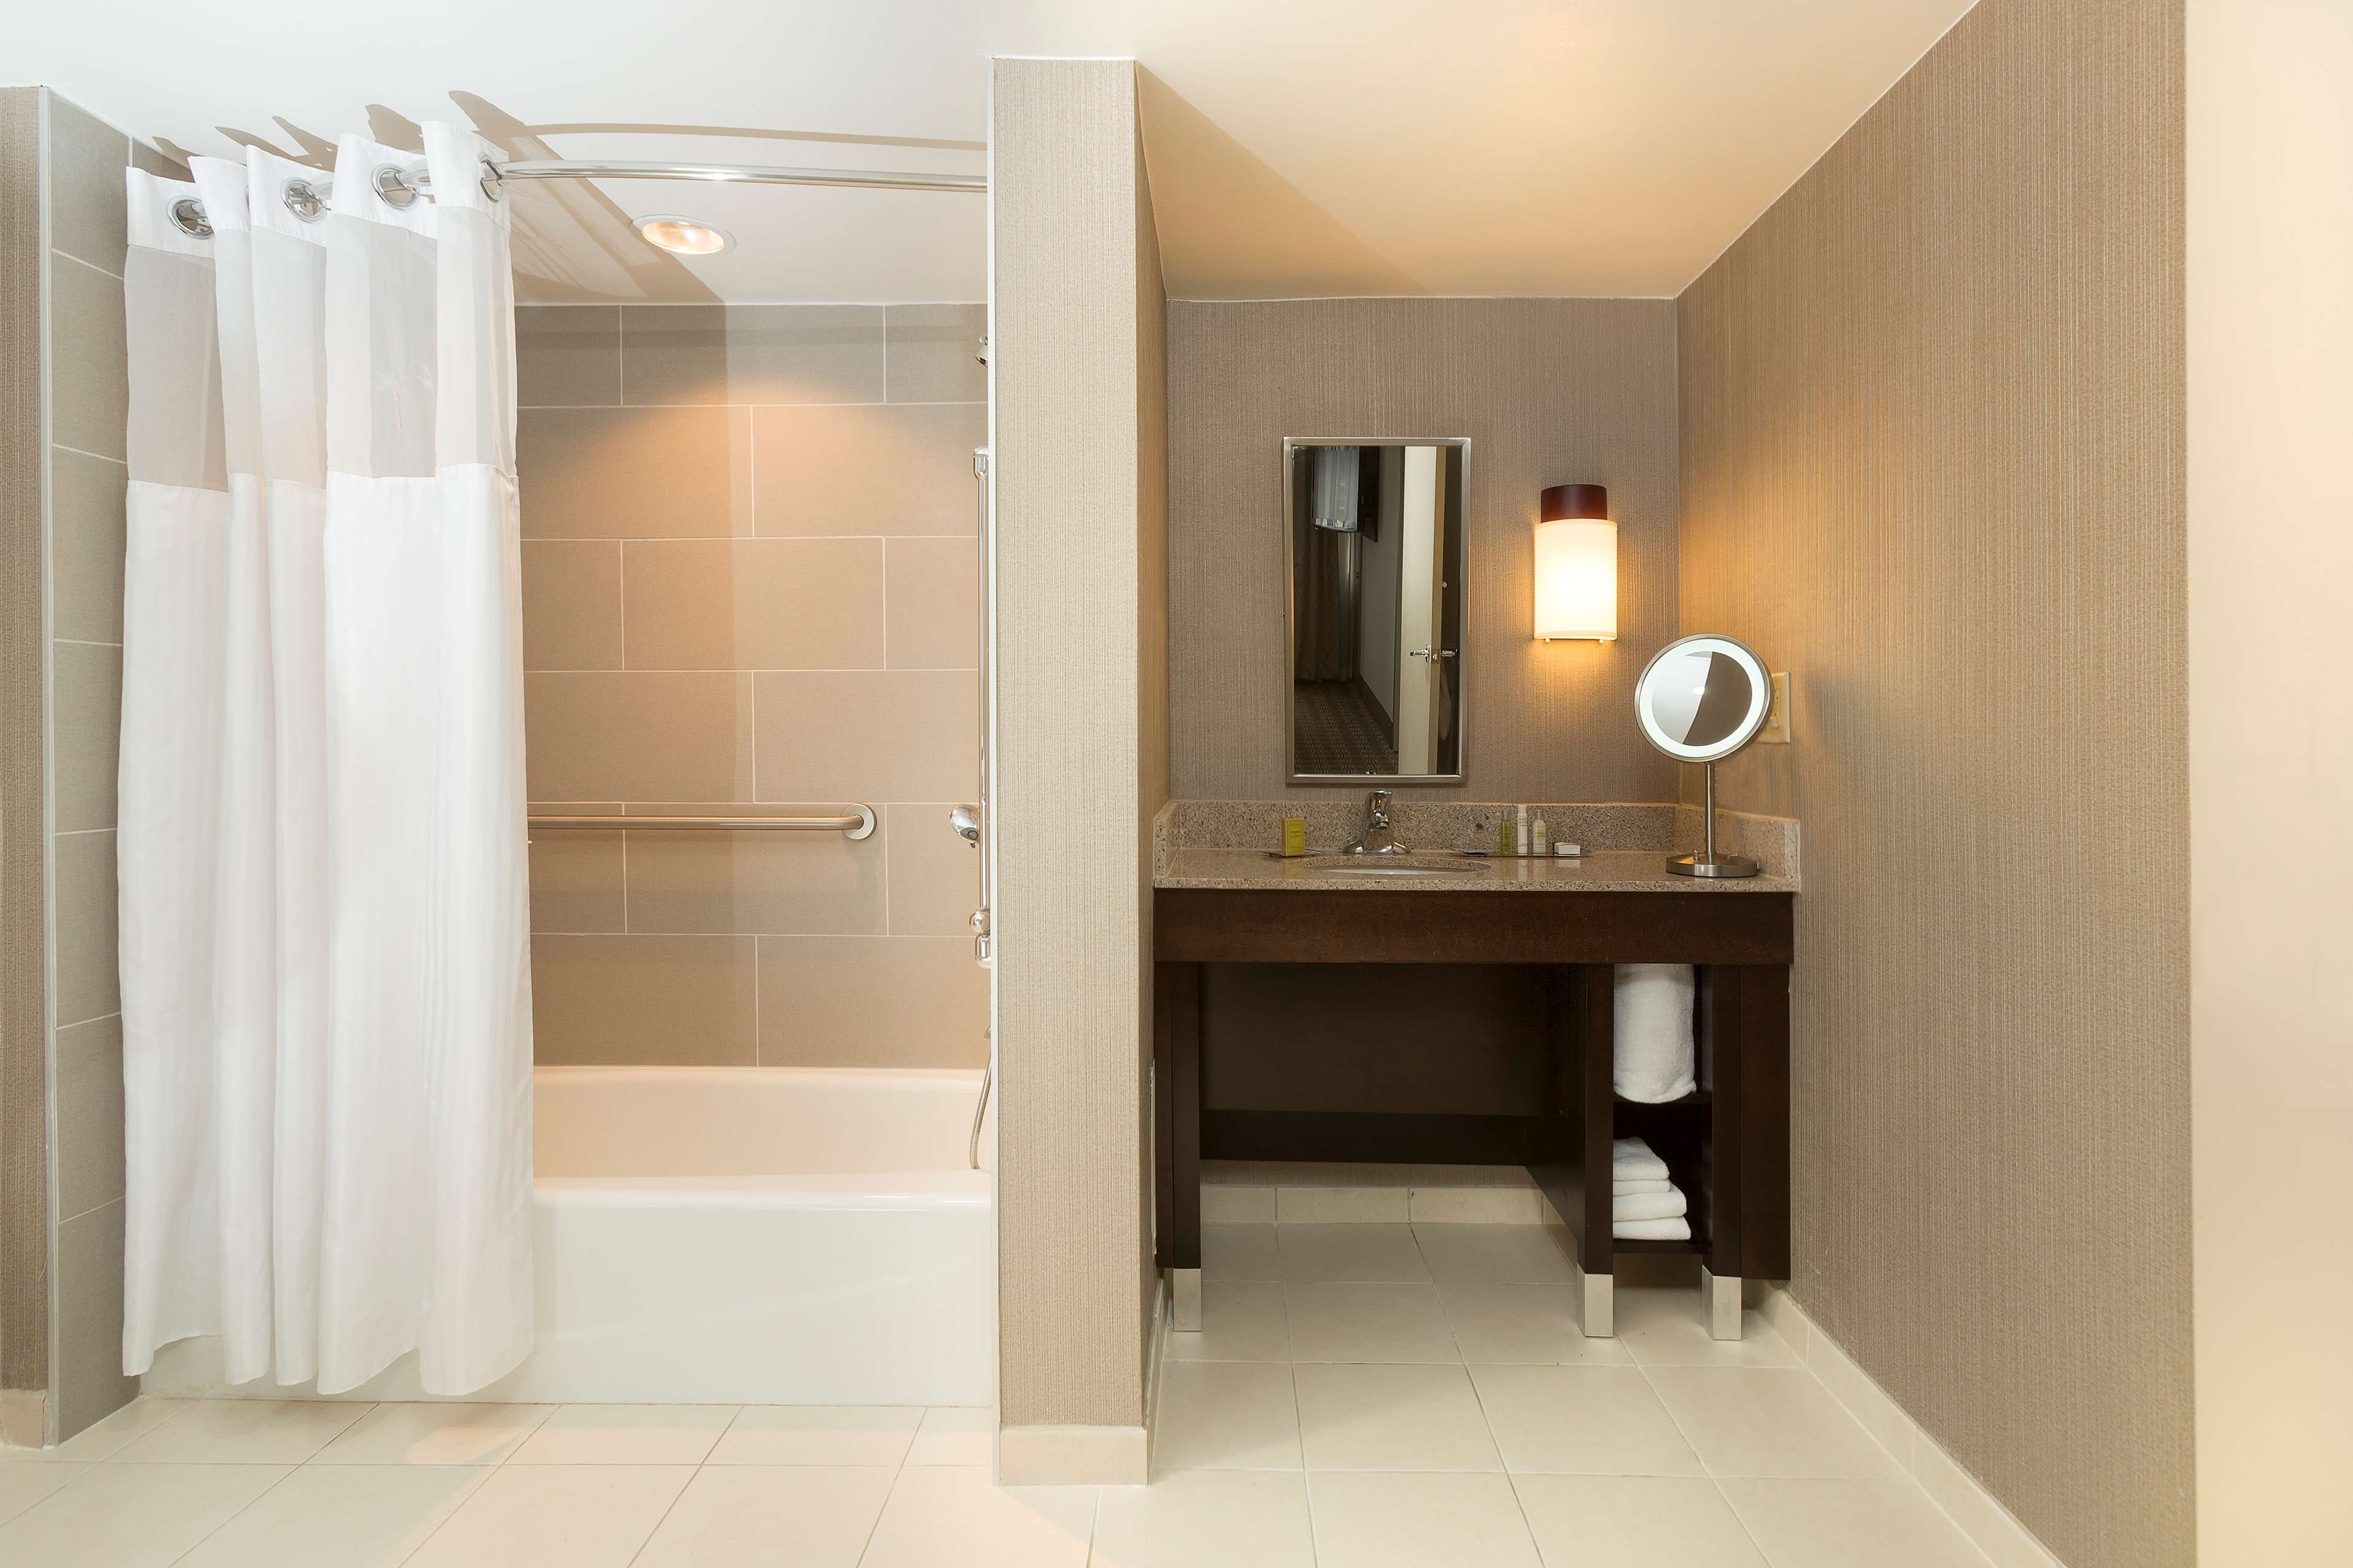 DoubleTree Suites by Hilton Hotel Nashville Airport image 32